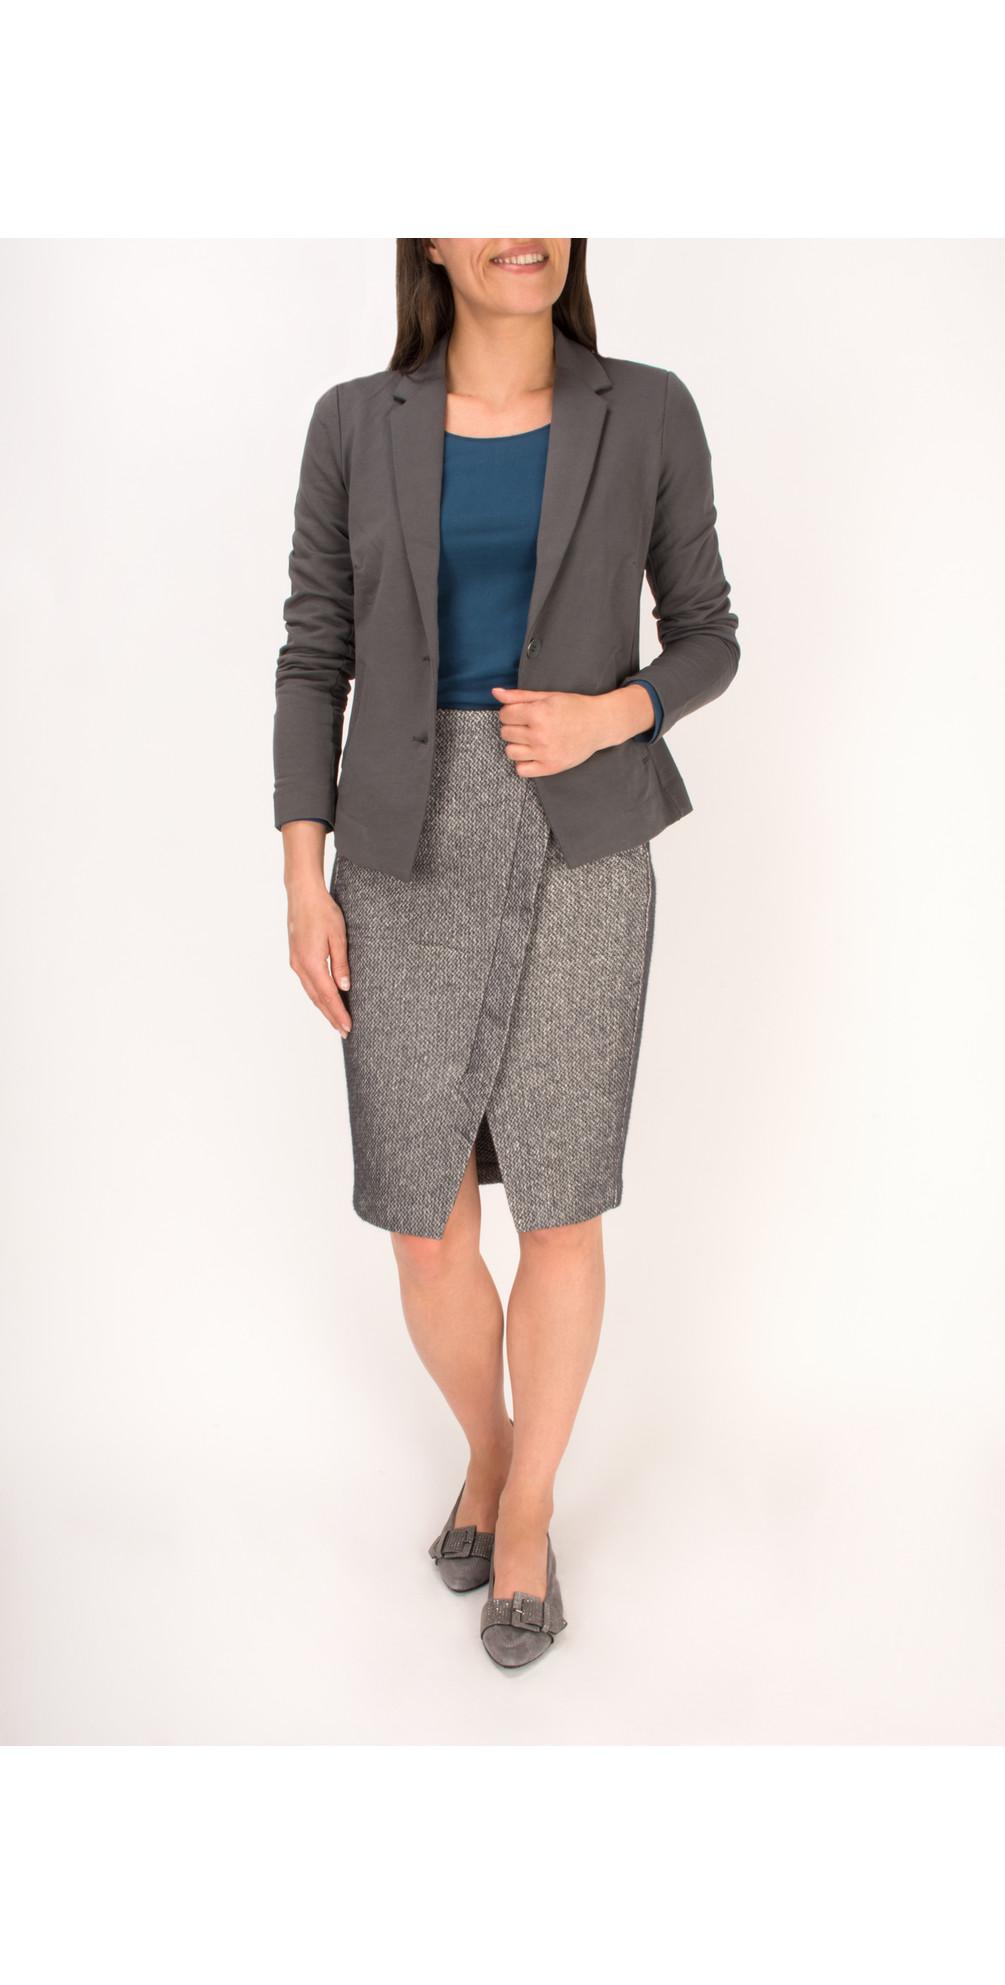 Jacquard Fleece Skirt main image